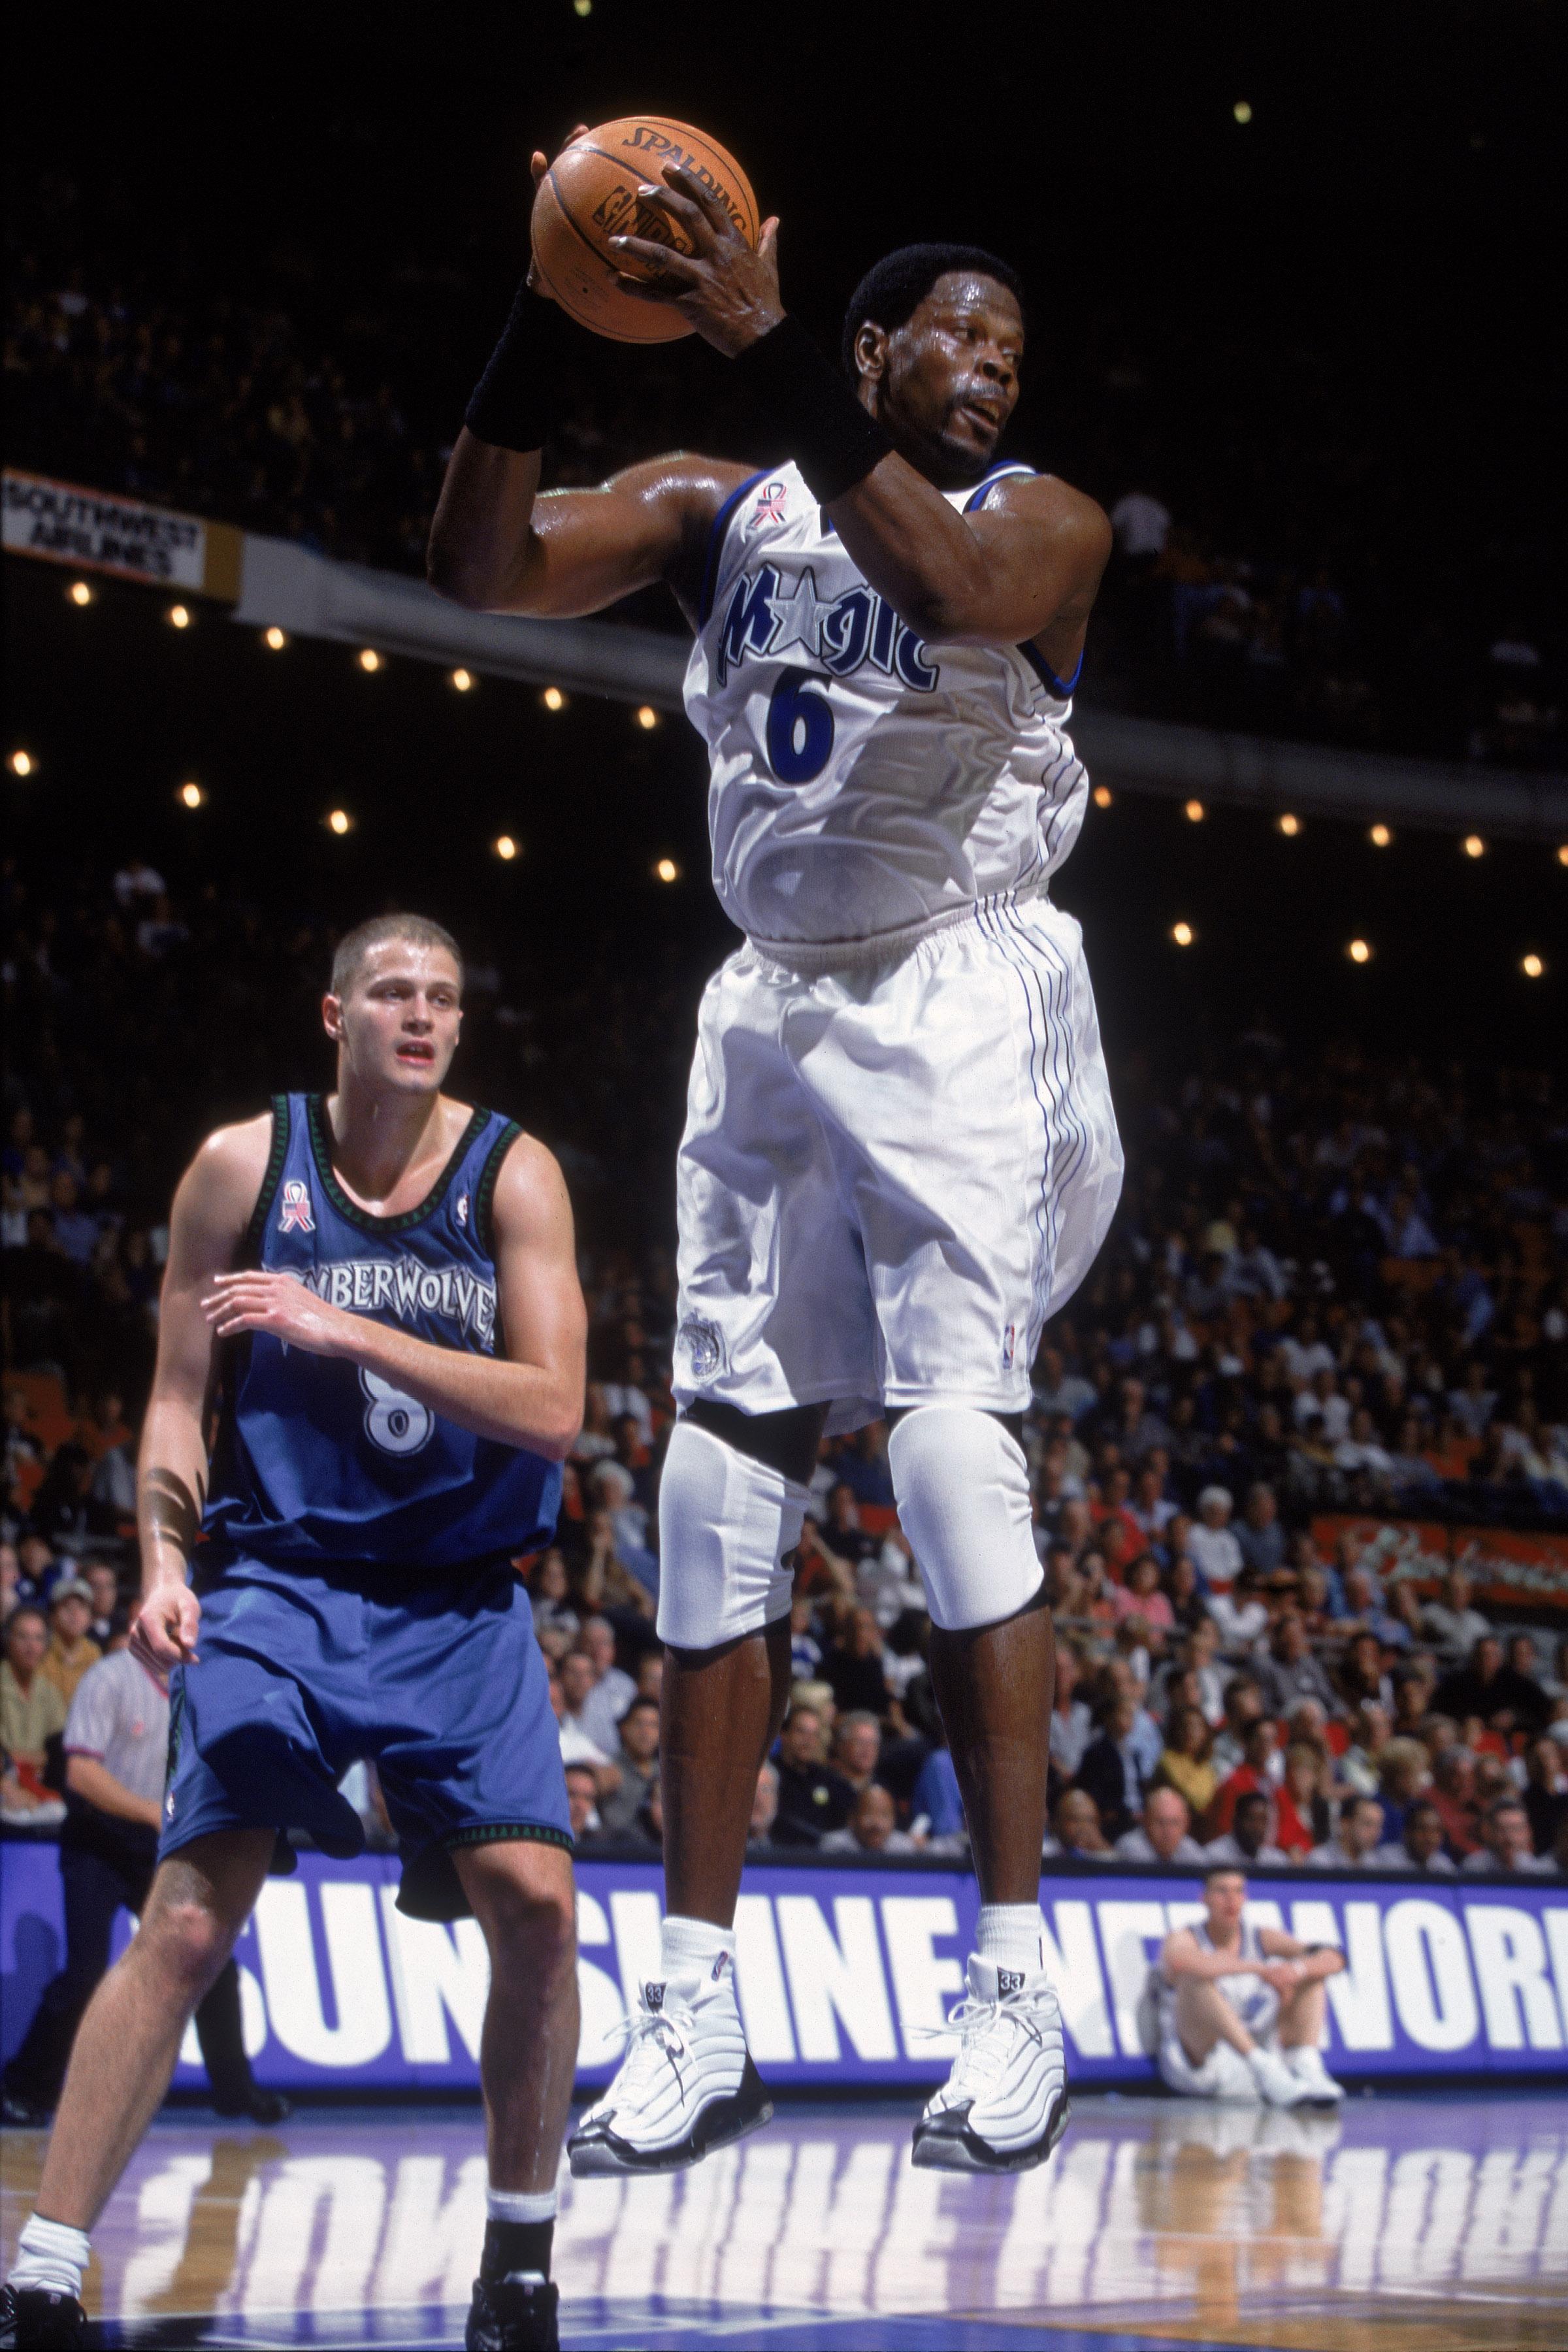 95bd5866ca5 21 Nov 2001  Center Patrick Ewing  6 of the Orlando Magic rebounds during  the